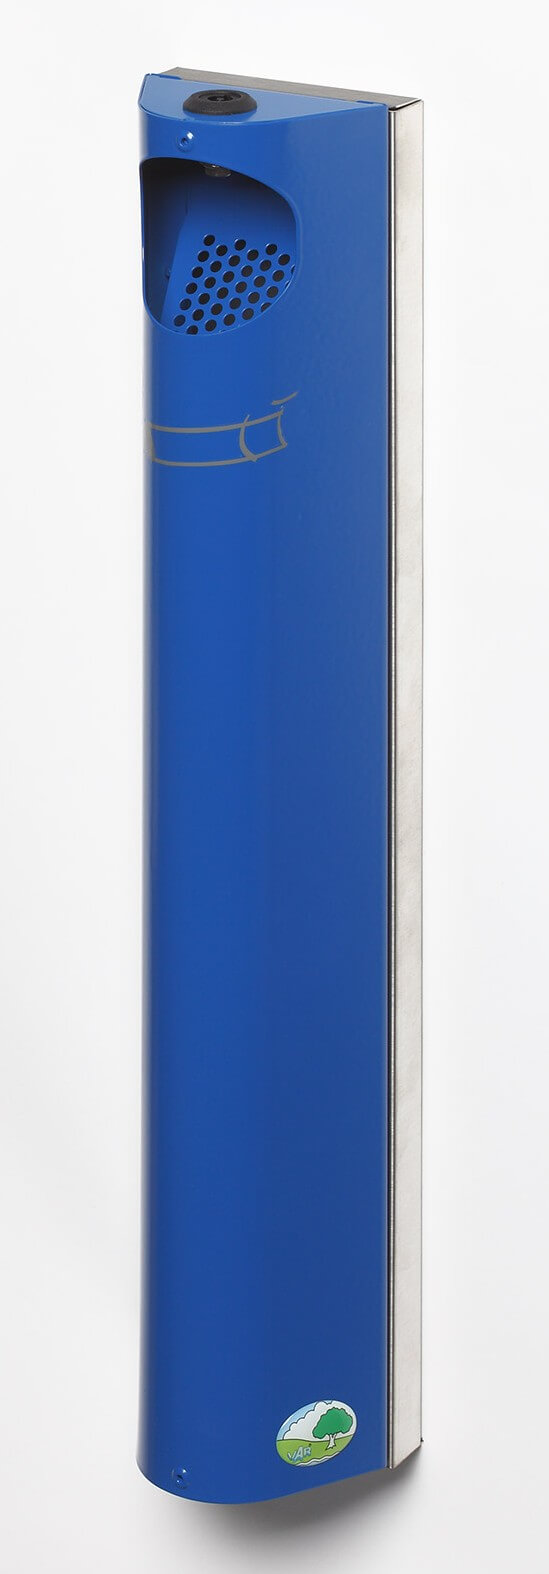 Cendrier rond mural avec serrure 3.5 L